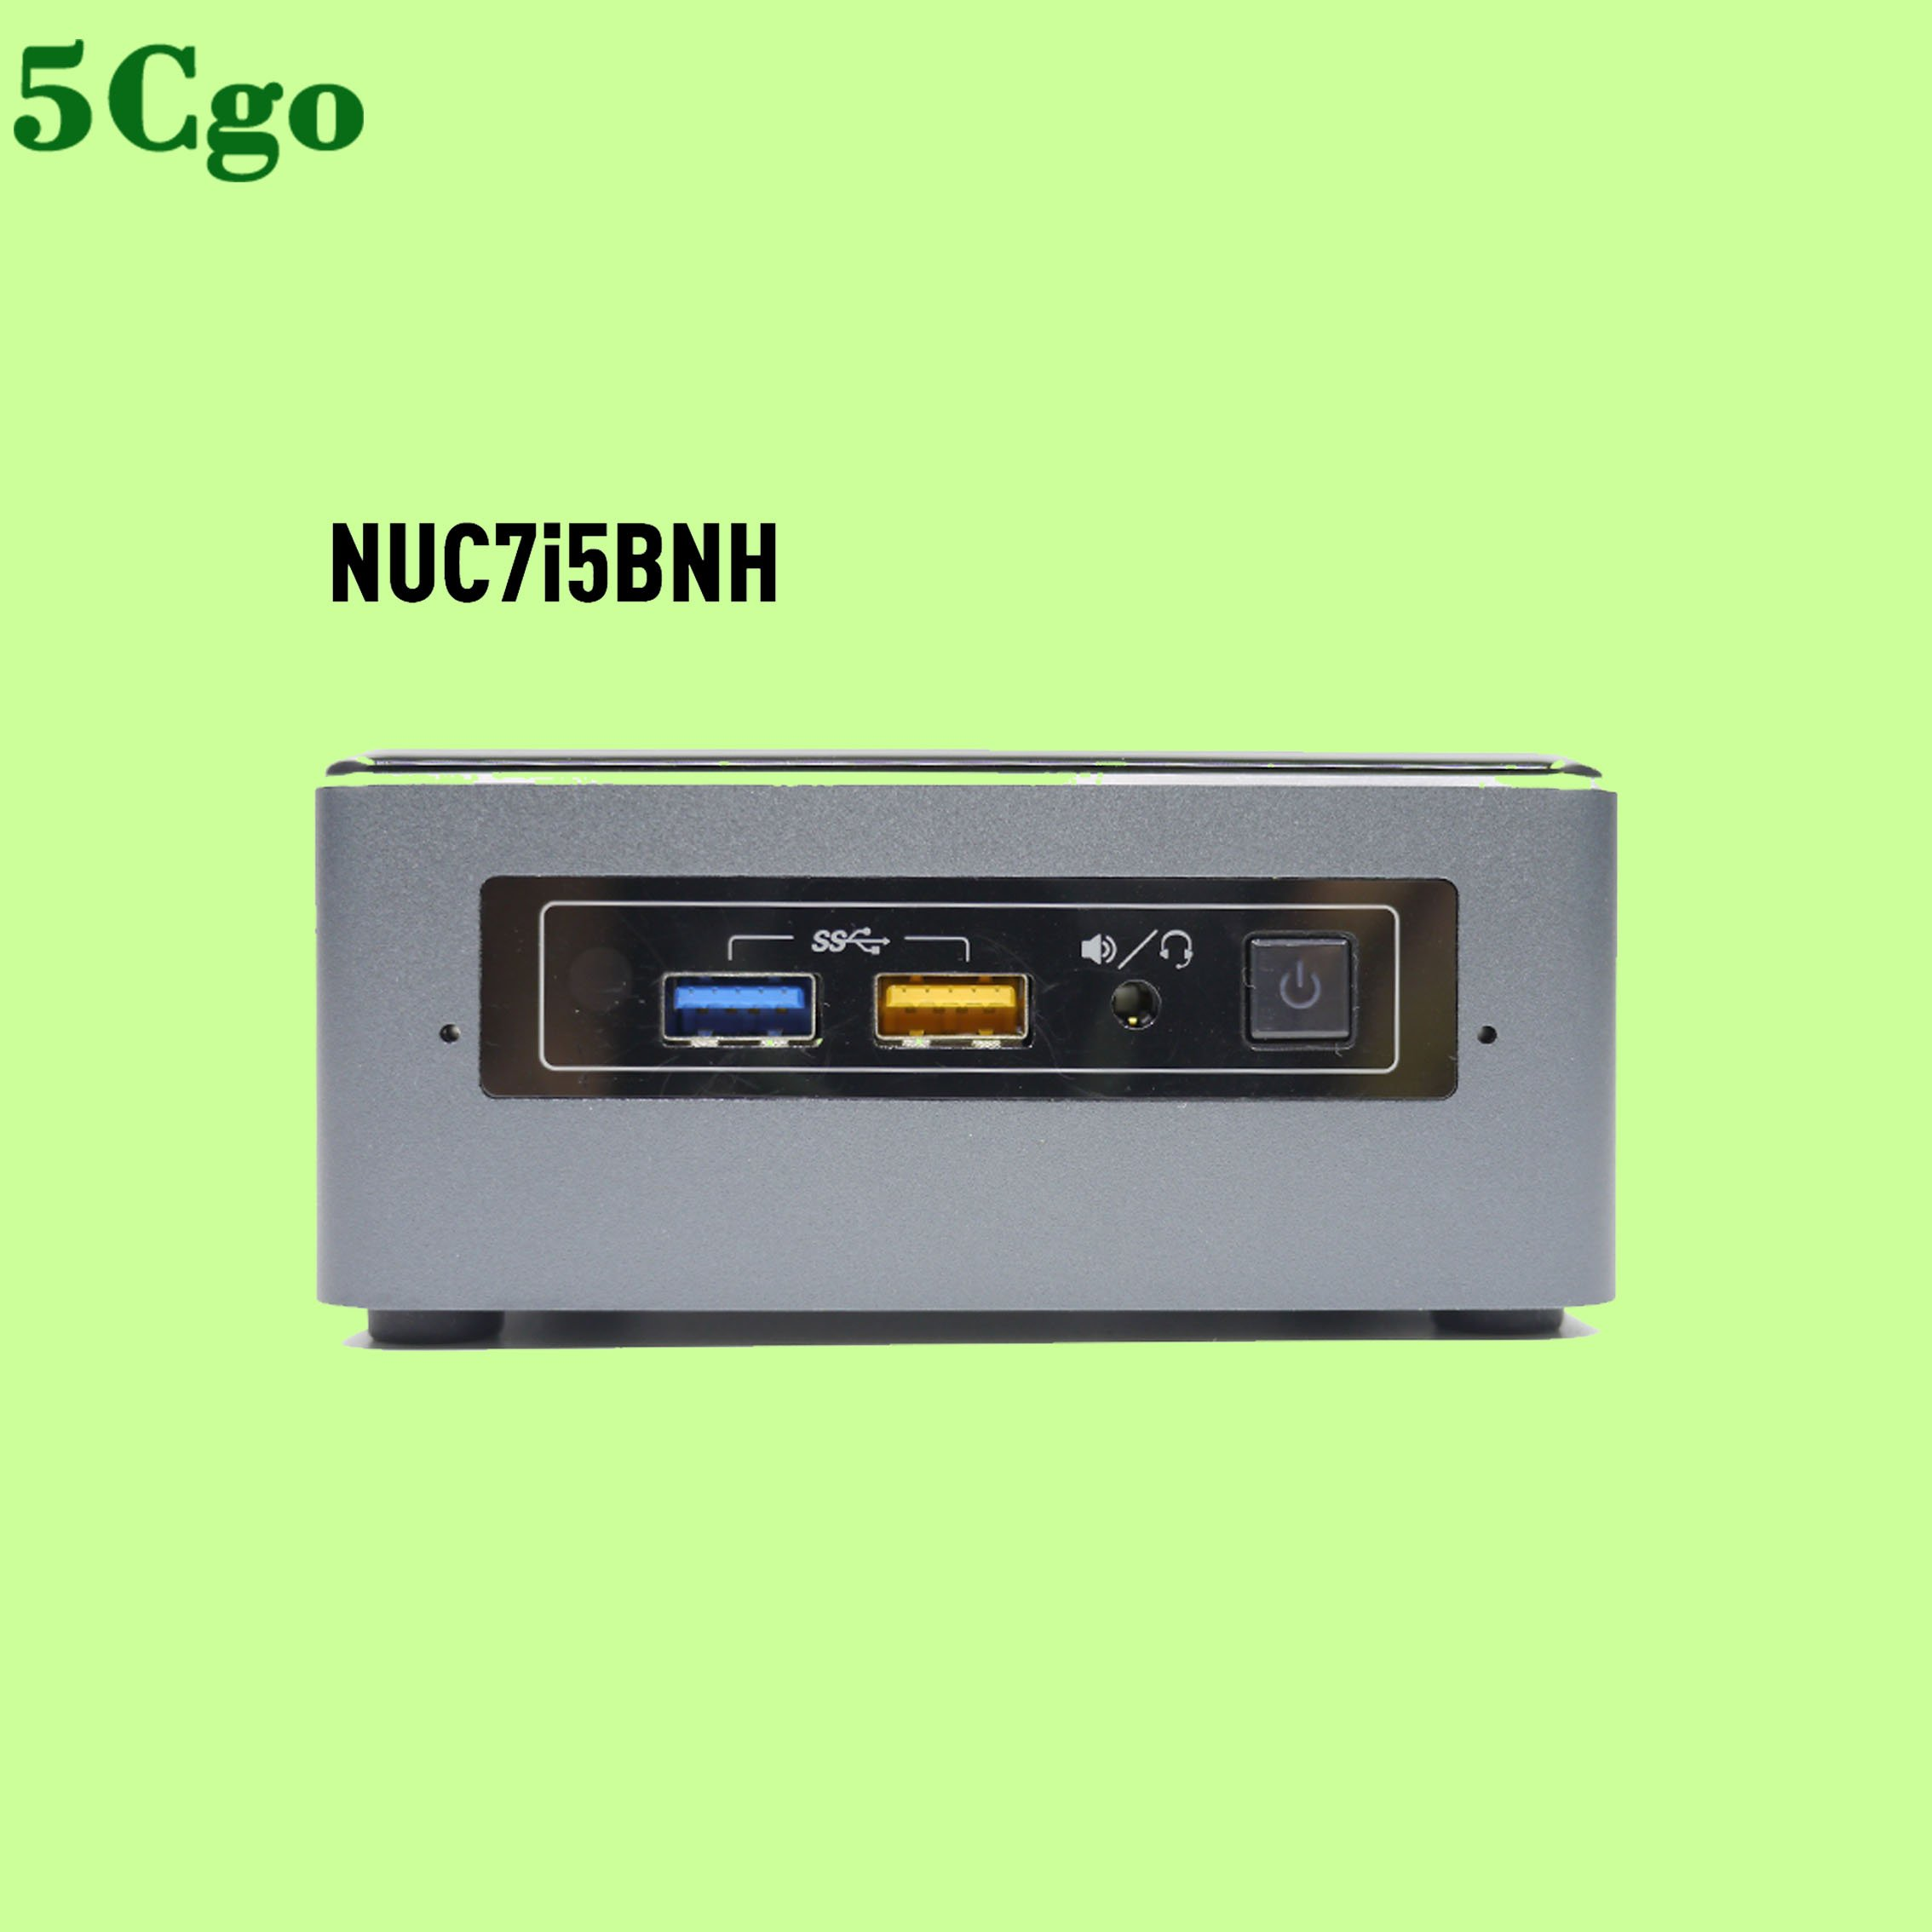 5Cgo【含稅】英特爾八代NUC8i3CYSM NUC7i5BNH7代迷你電腦主機PC套件t570306350032